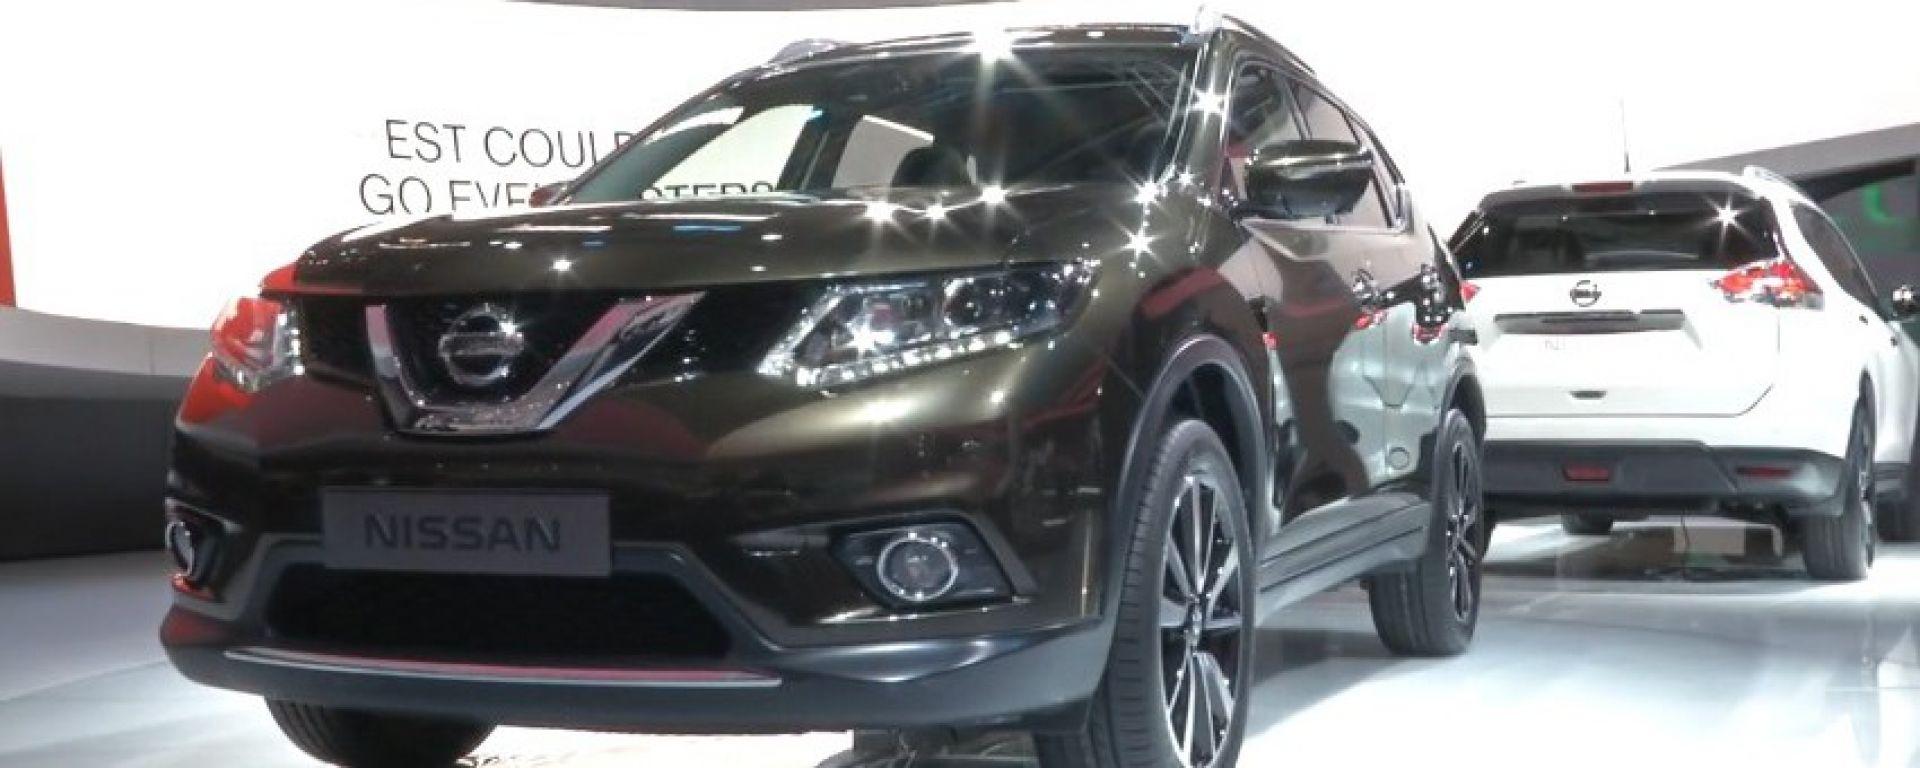 Francoforte 2013, lo stand Nissan